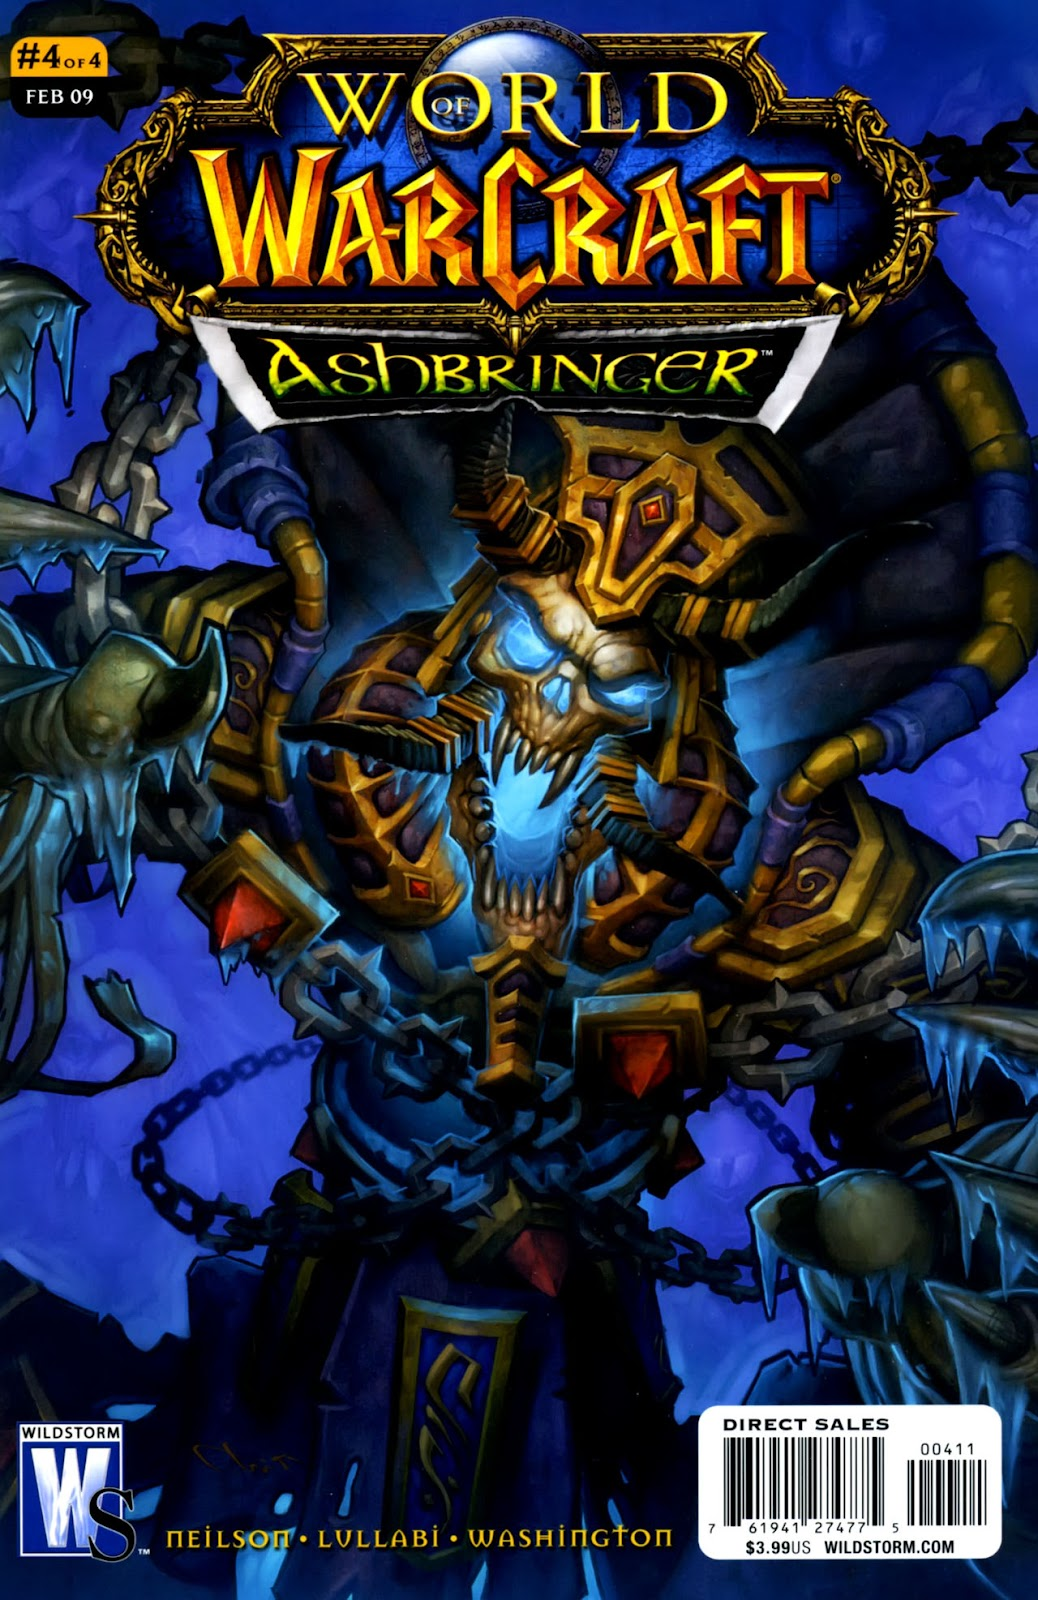 World of Warcraft: Ashbringer issue 4 - Page 1